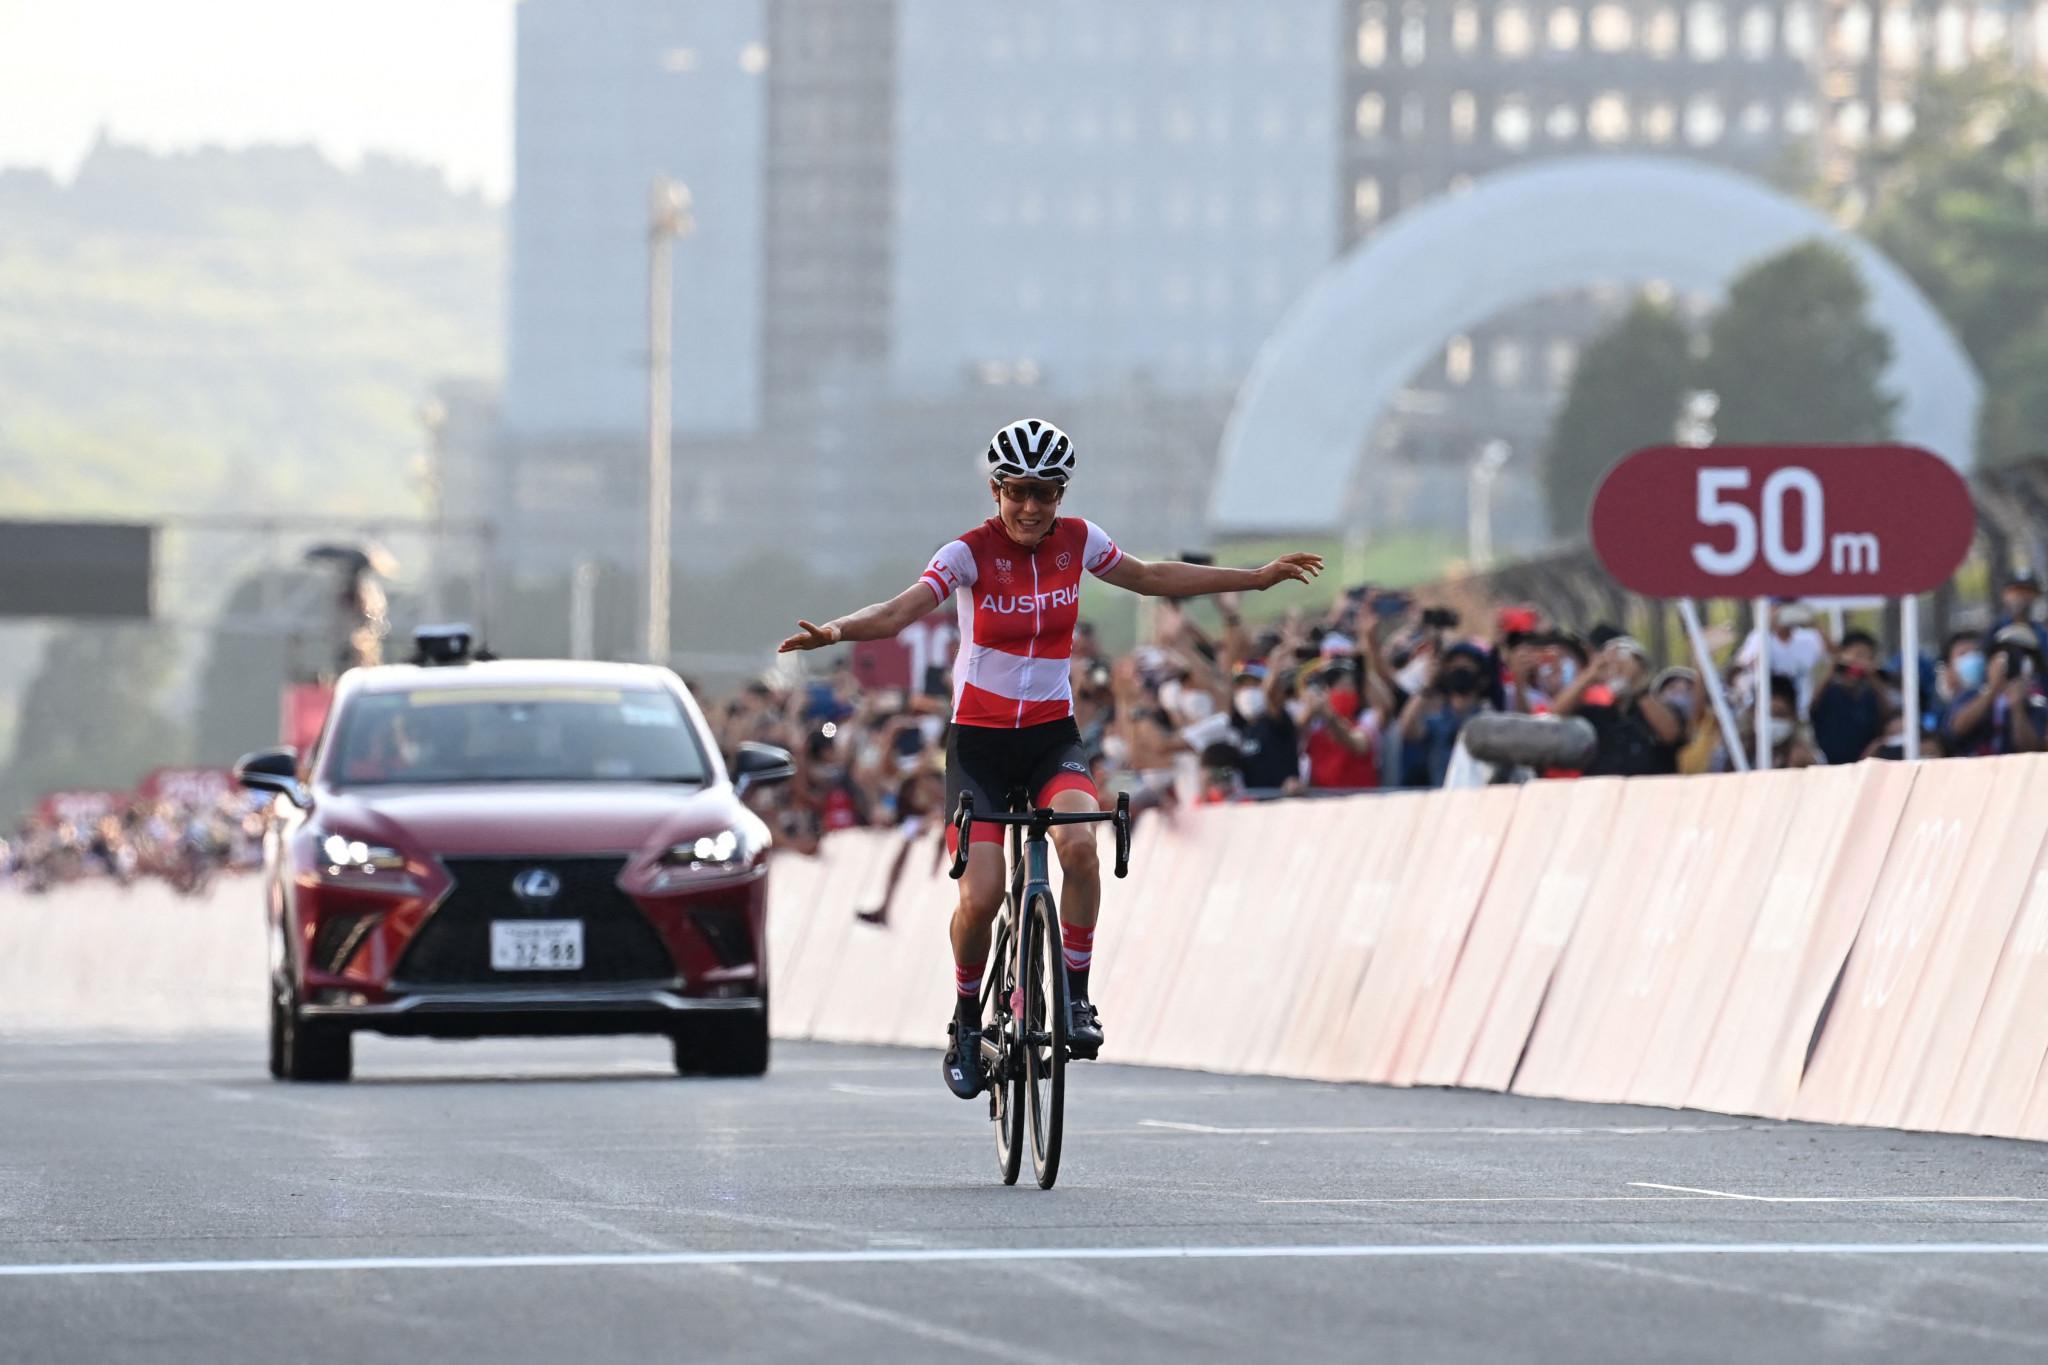 Kiesenhofer claims shock women's road race gold at Tokyo 2020 after breakaway